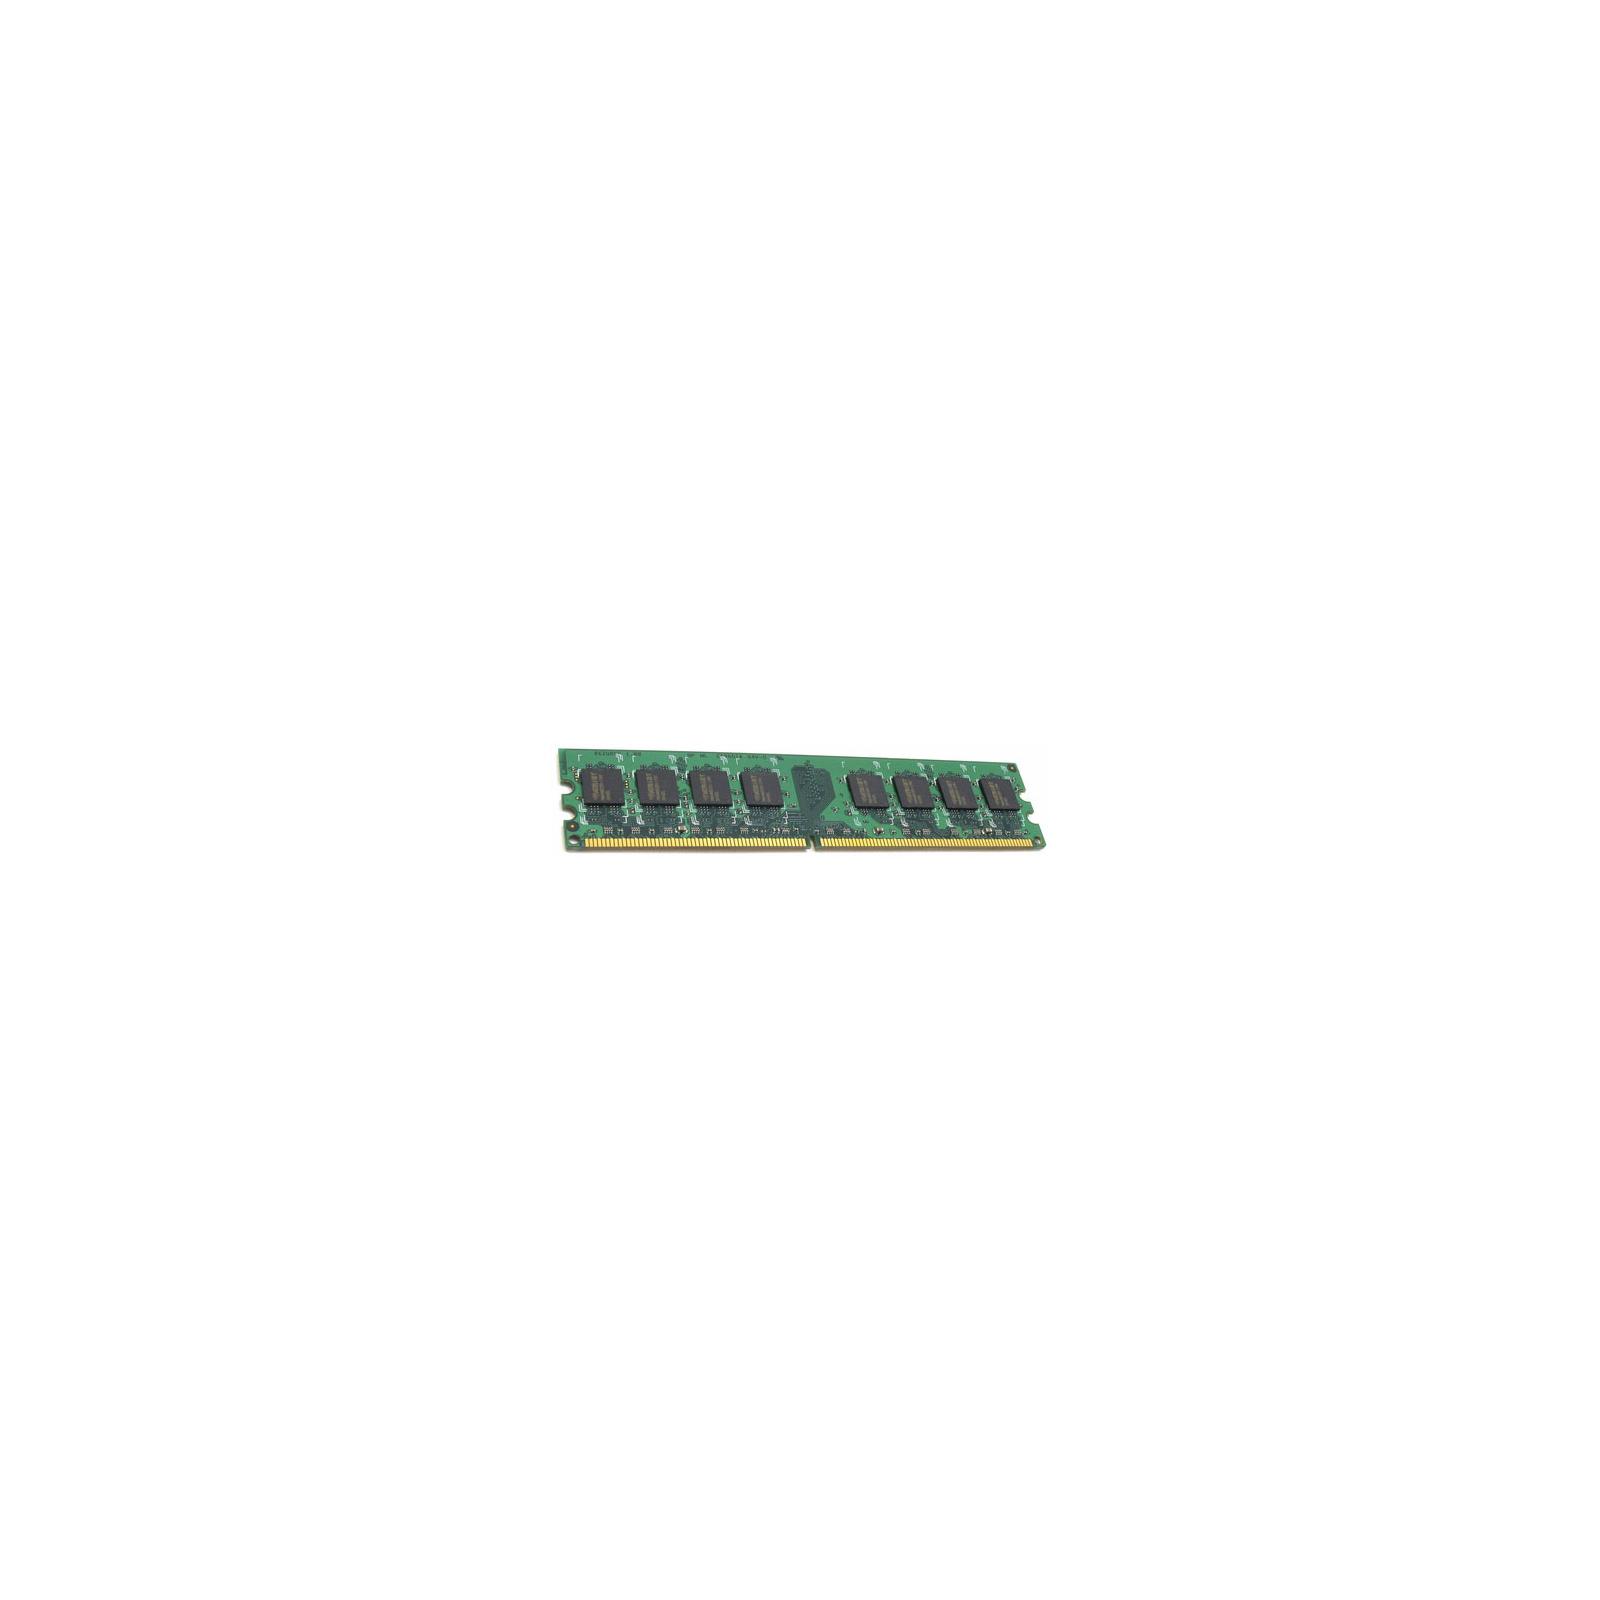 Модуль памяти для компьютера DDR3 2GB 1333 MHz Ravelion (RV-M2G1333DDR3-256x8-9)